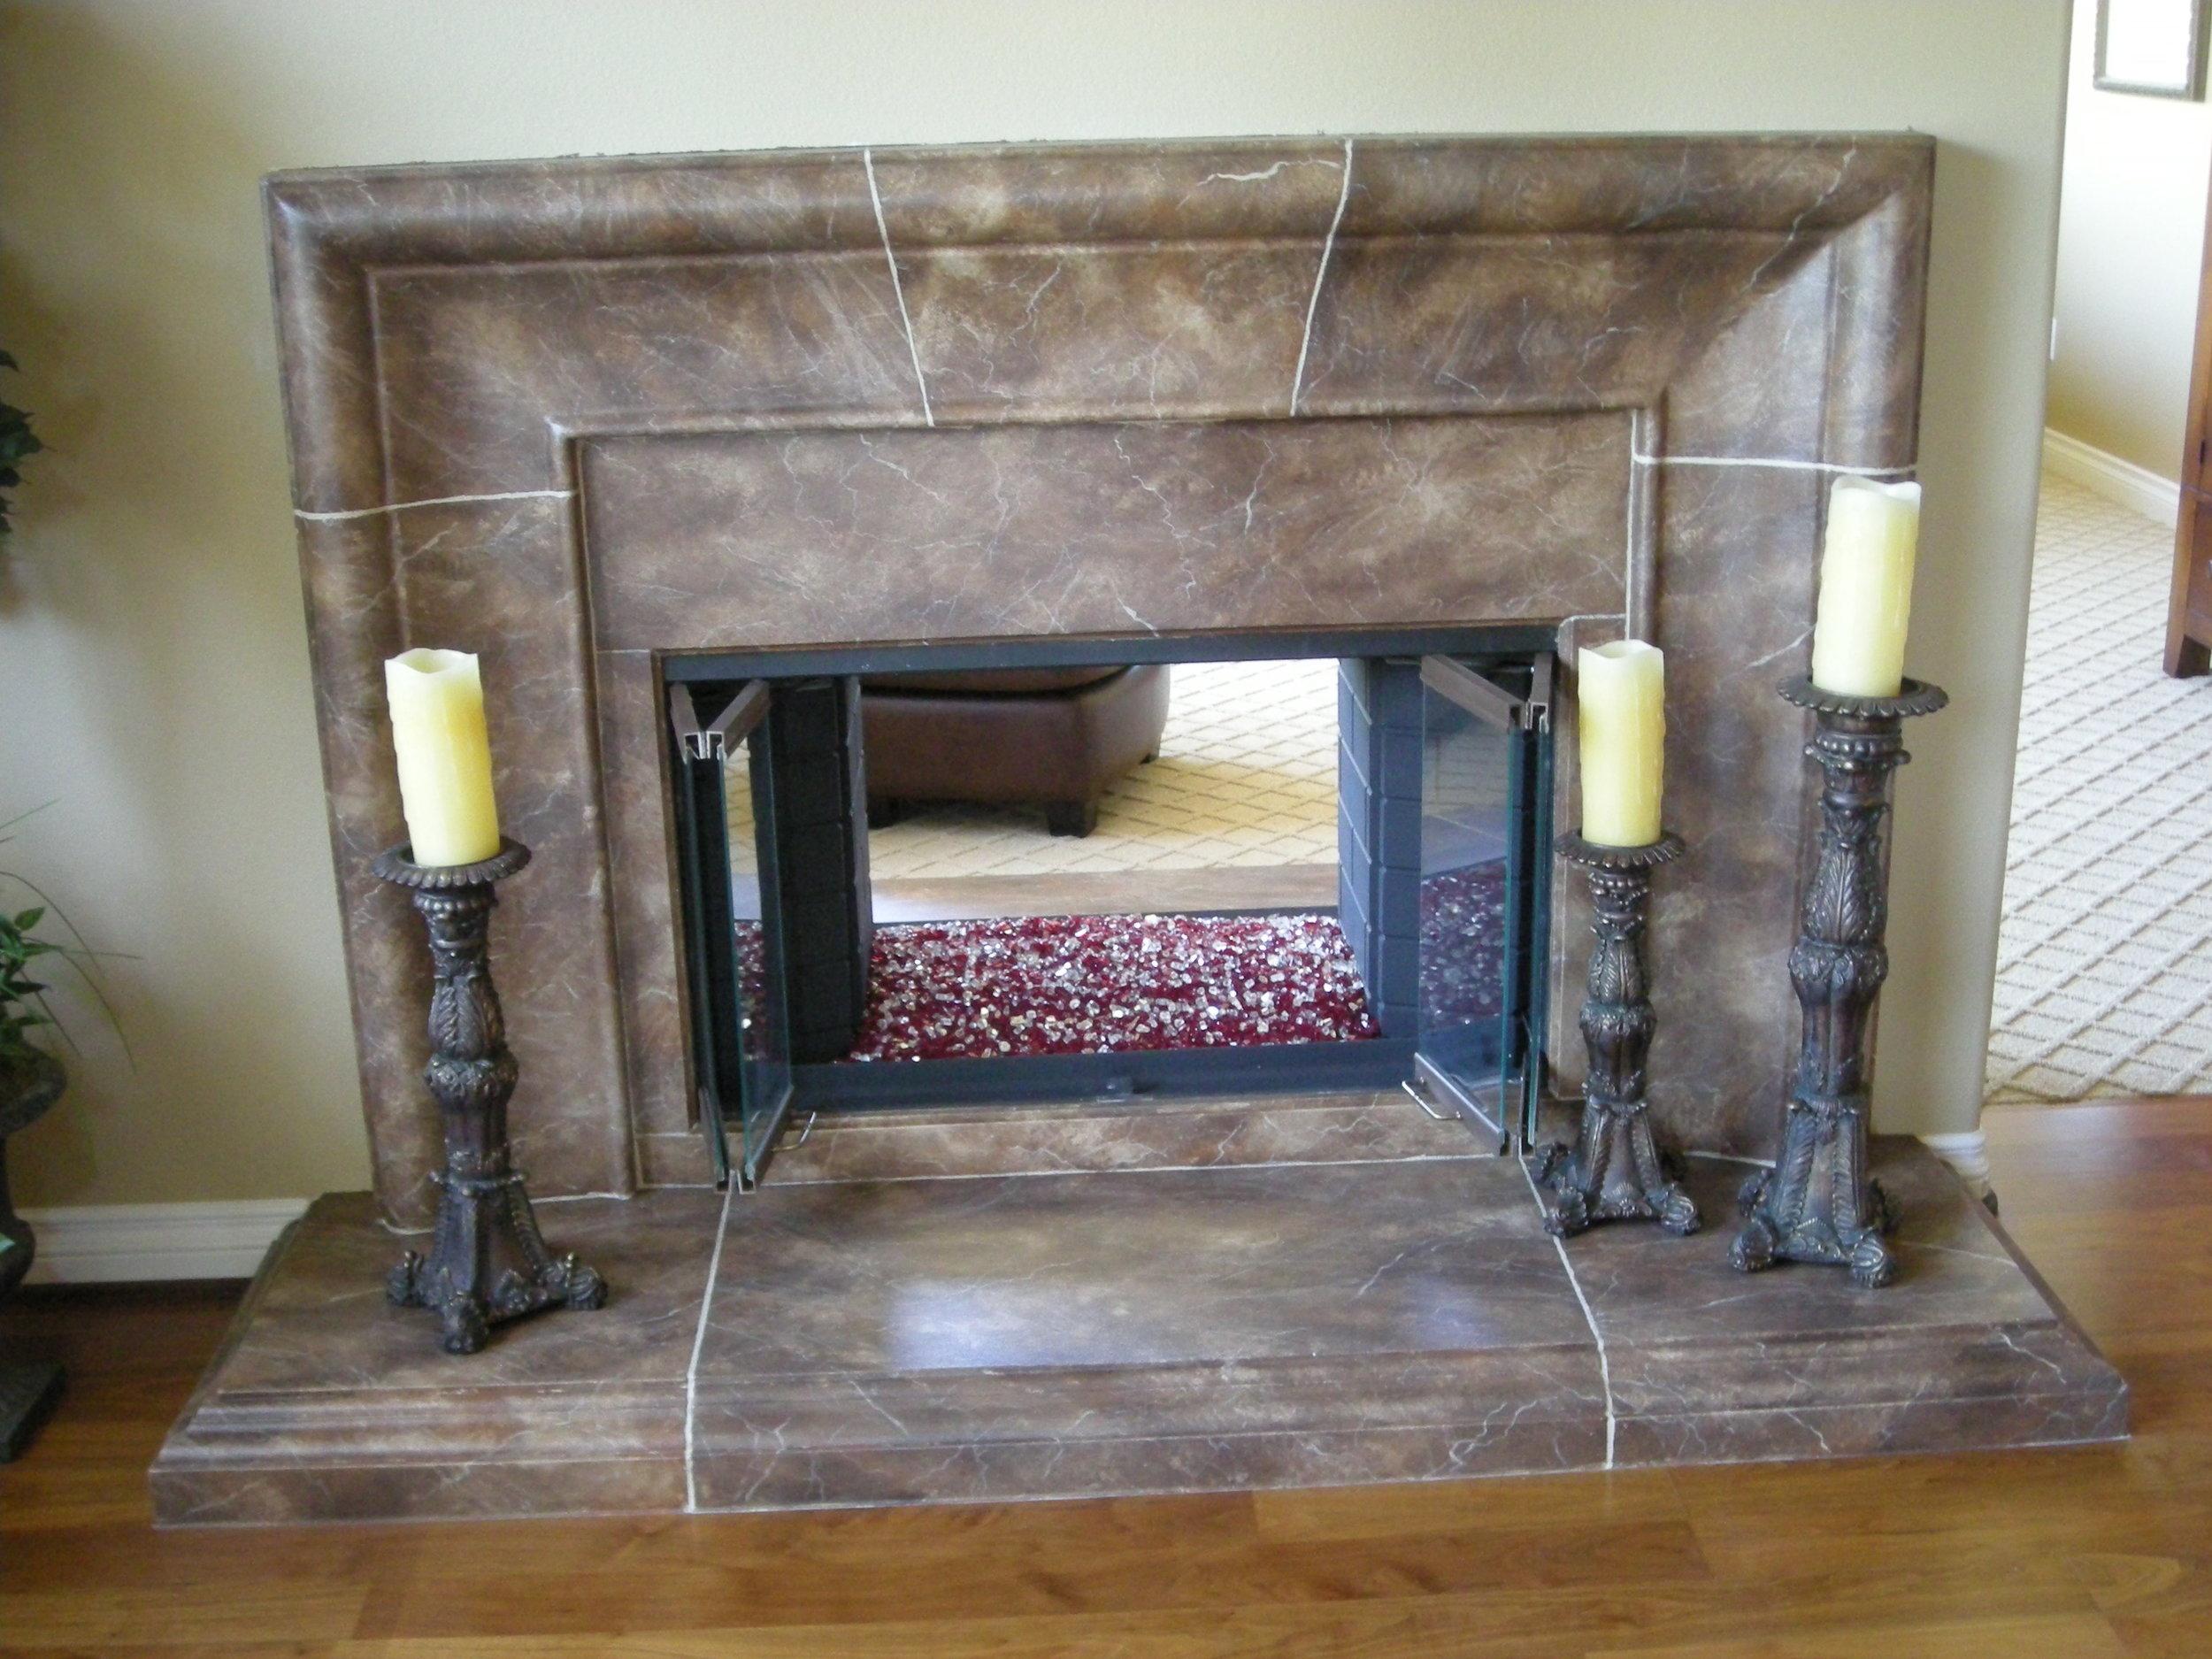 Diprima_fireplaces_007.jpg